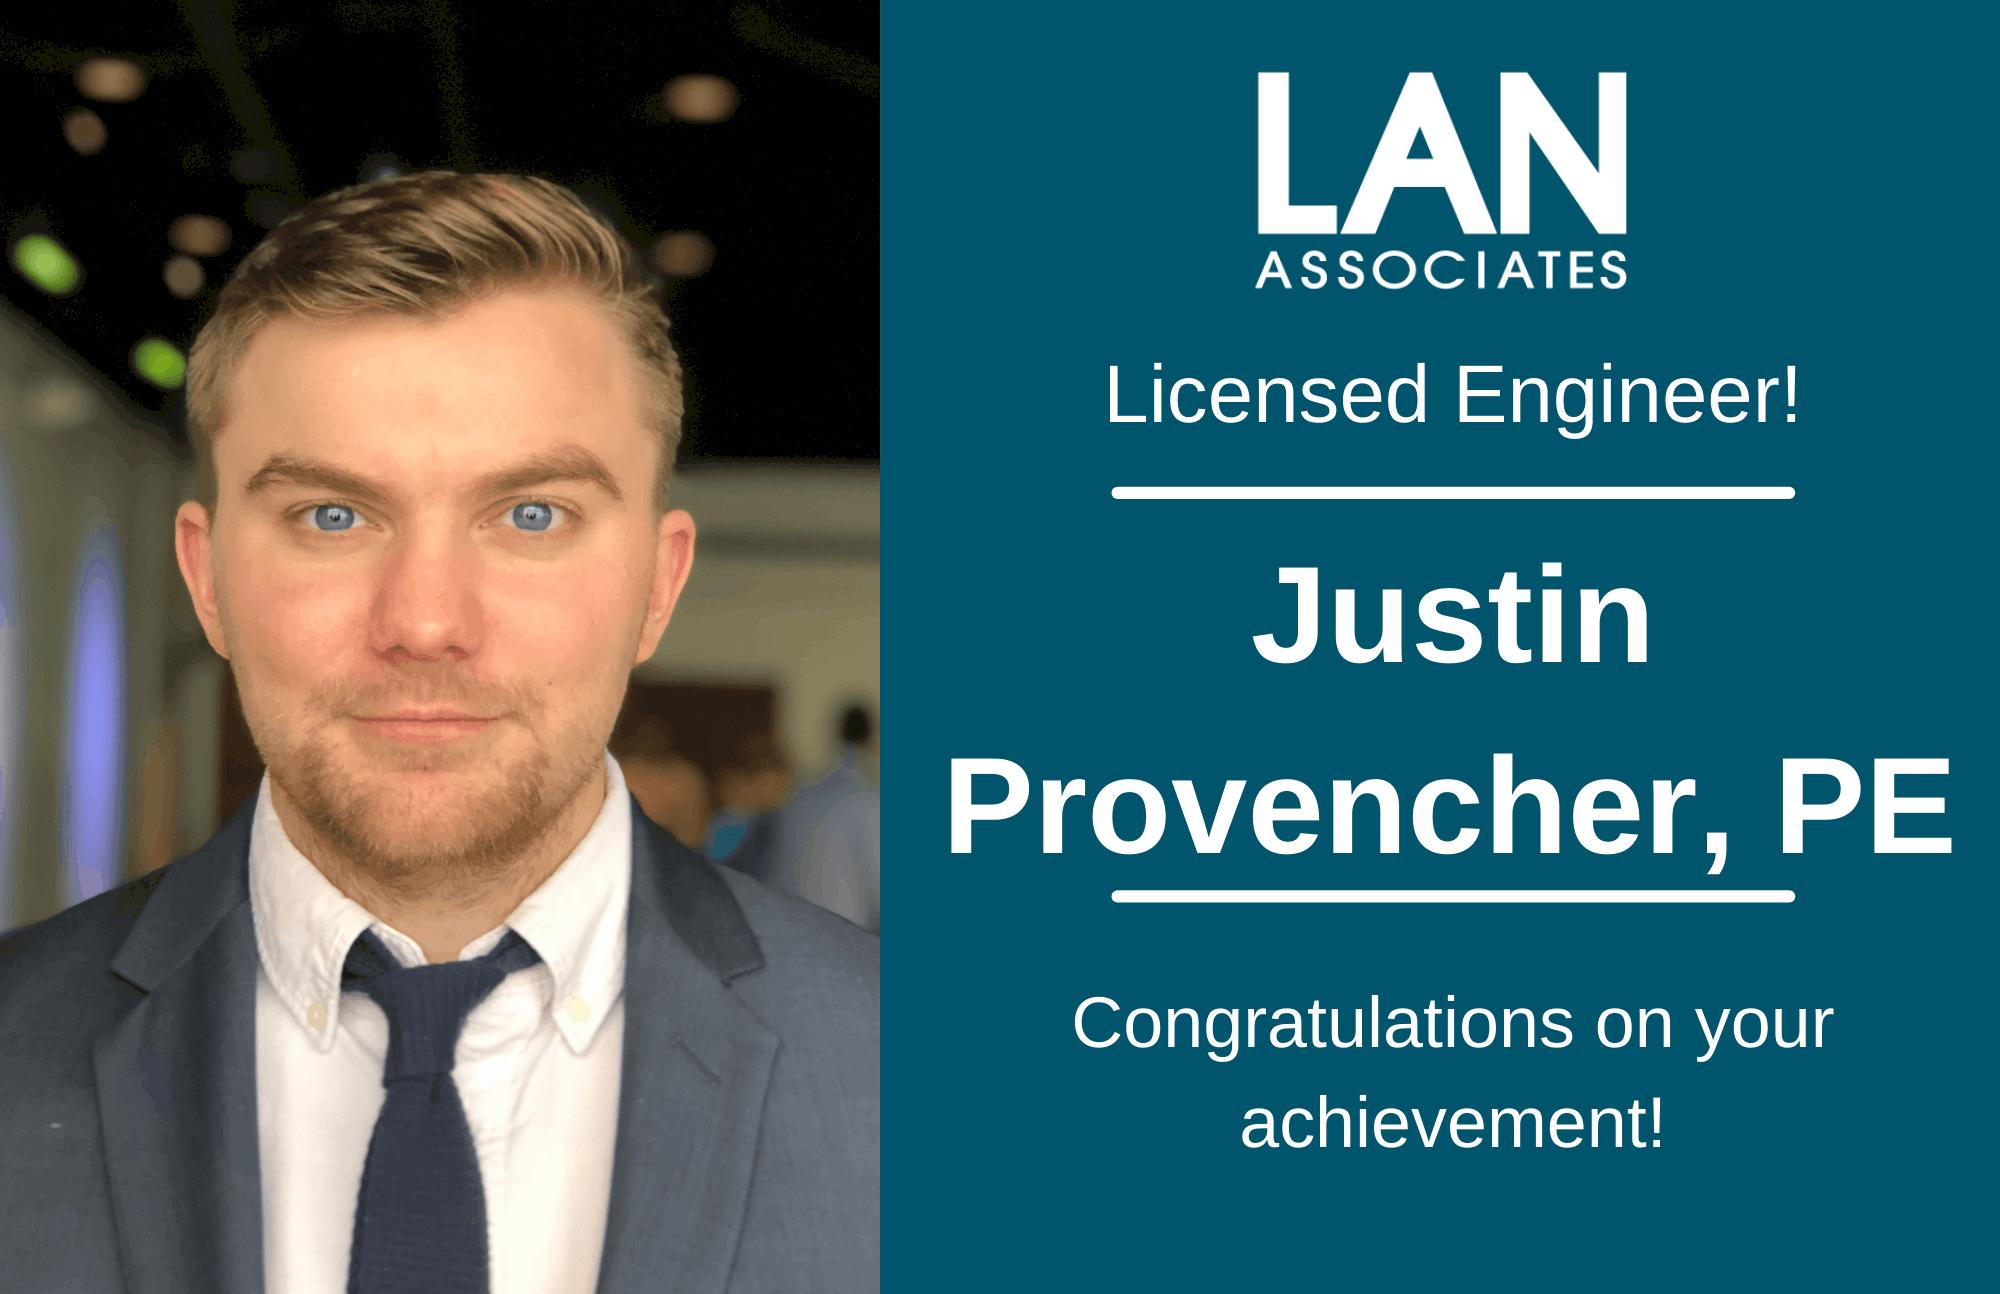 LAN Engineer Justin Provencher Receives License